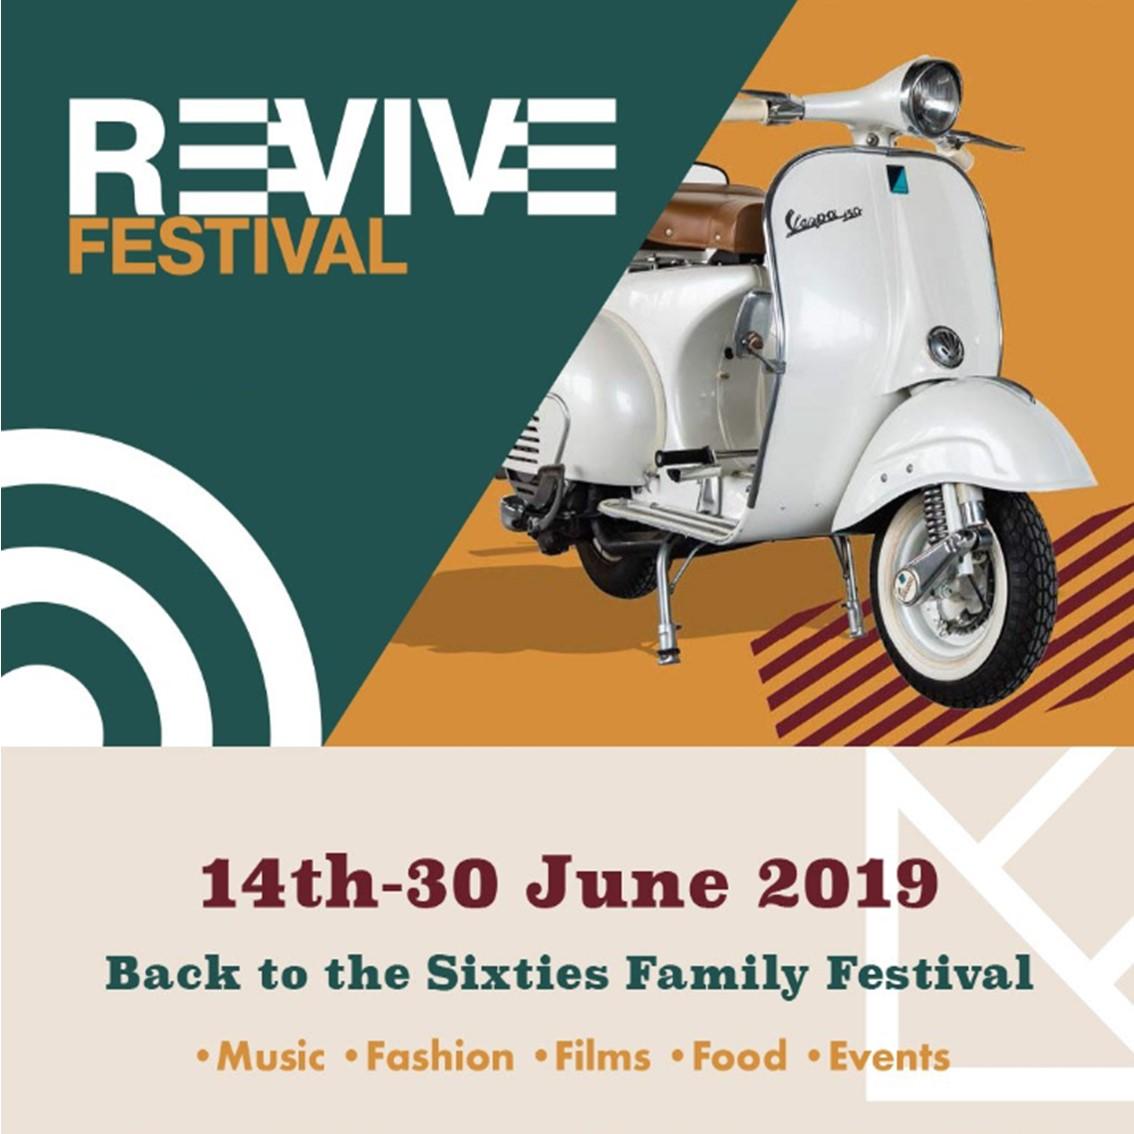 Revive festival